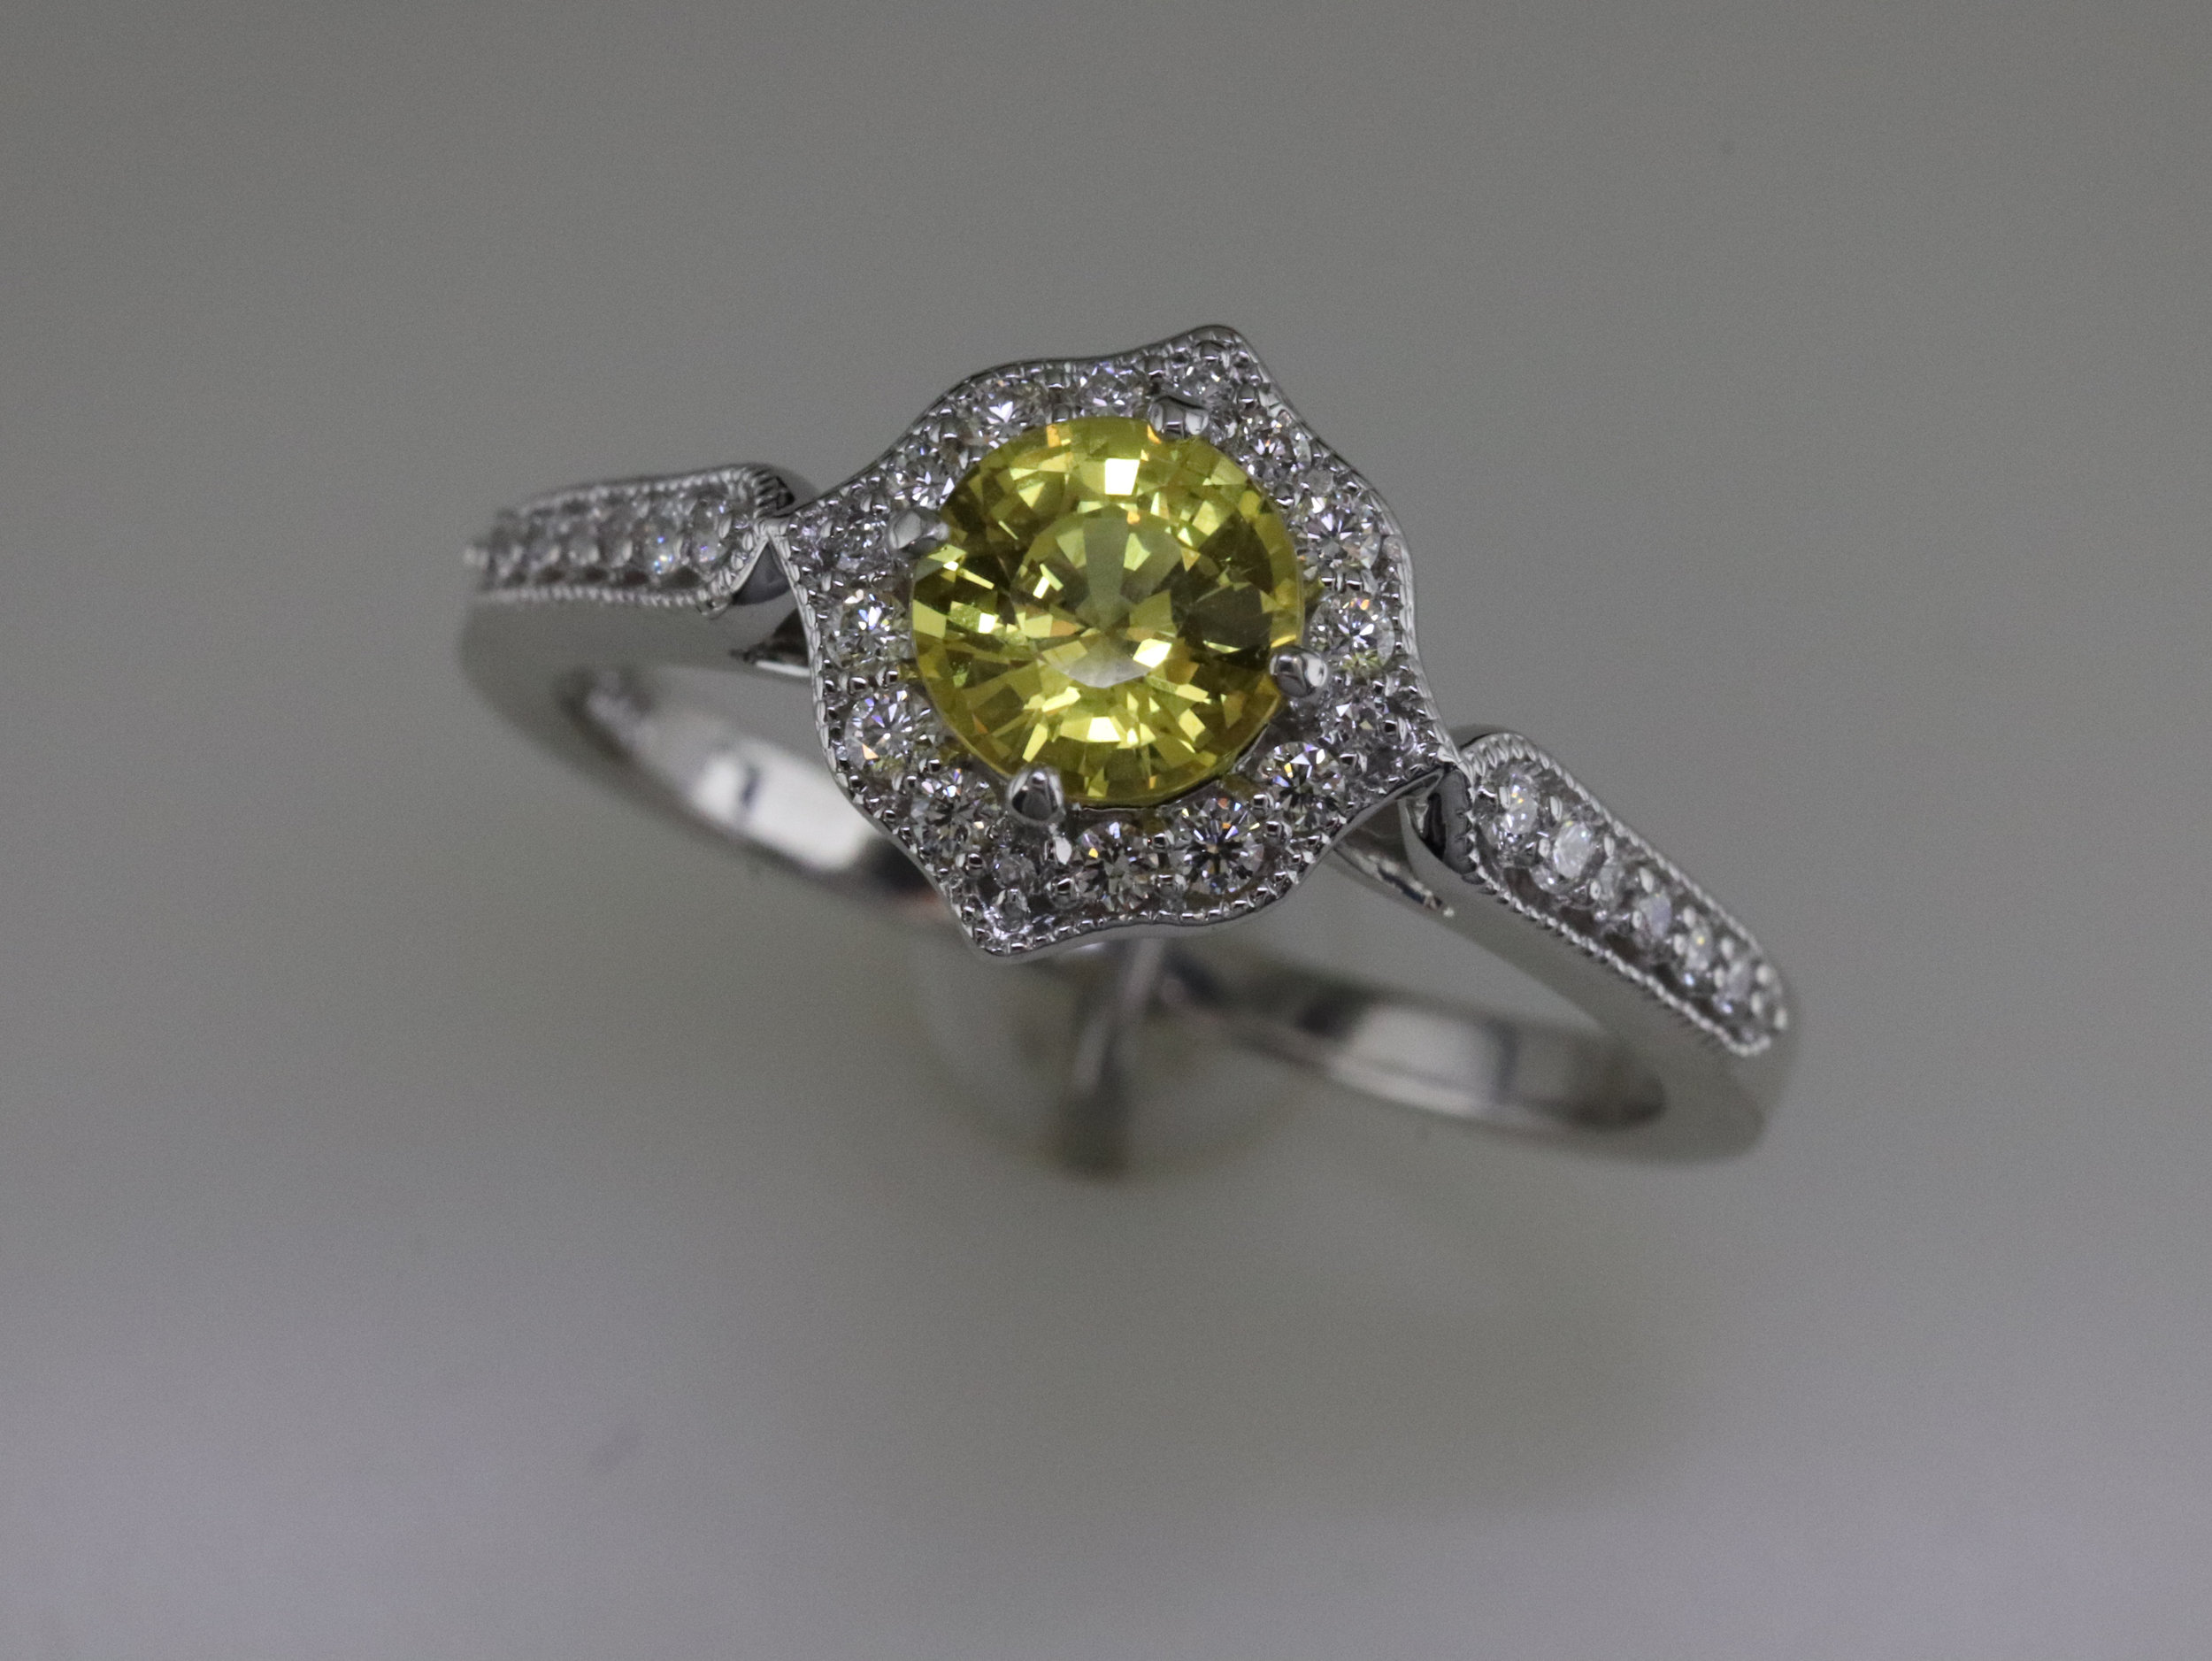 Exquisite yellow sapphire ring